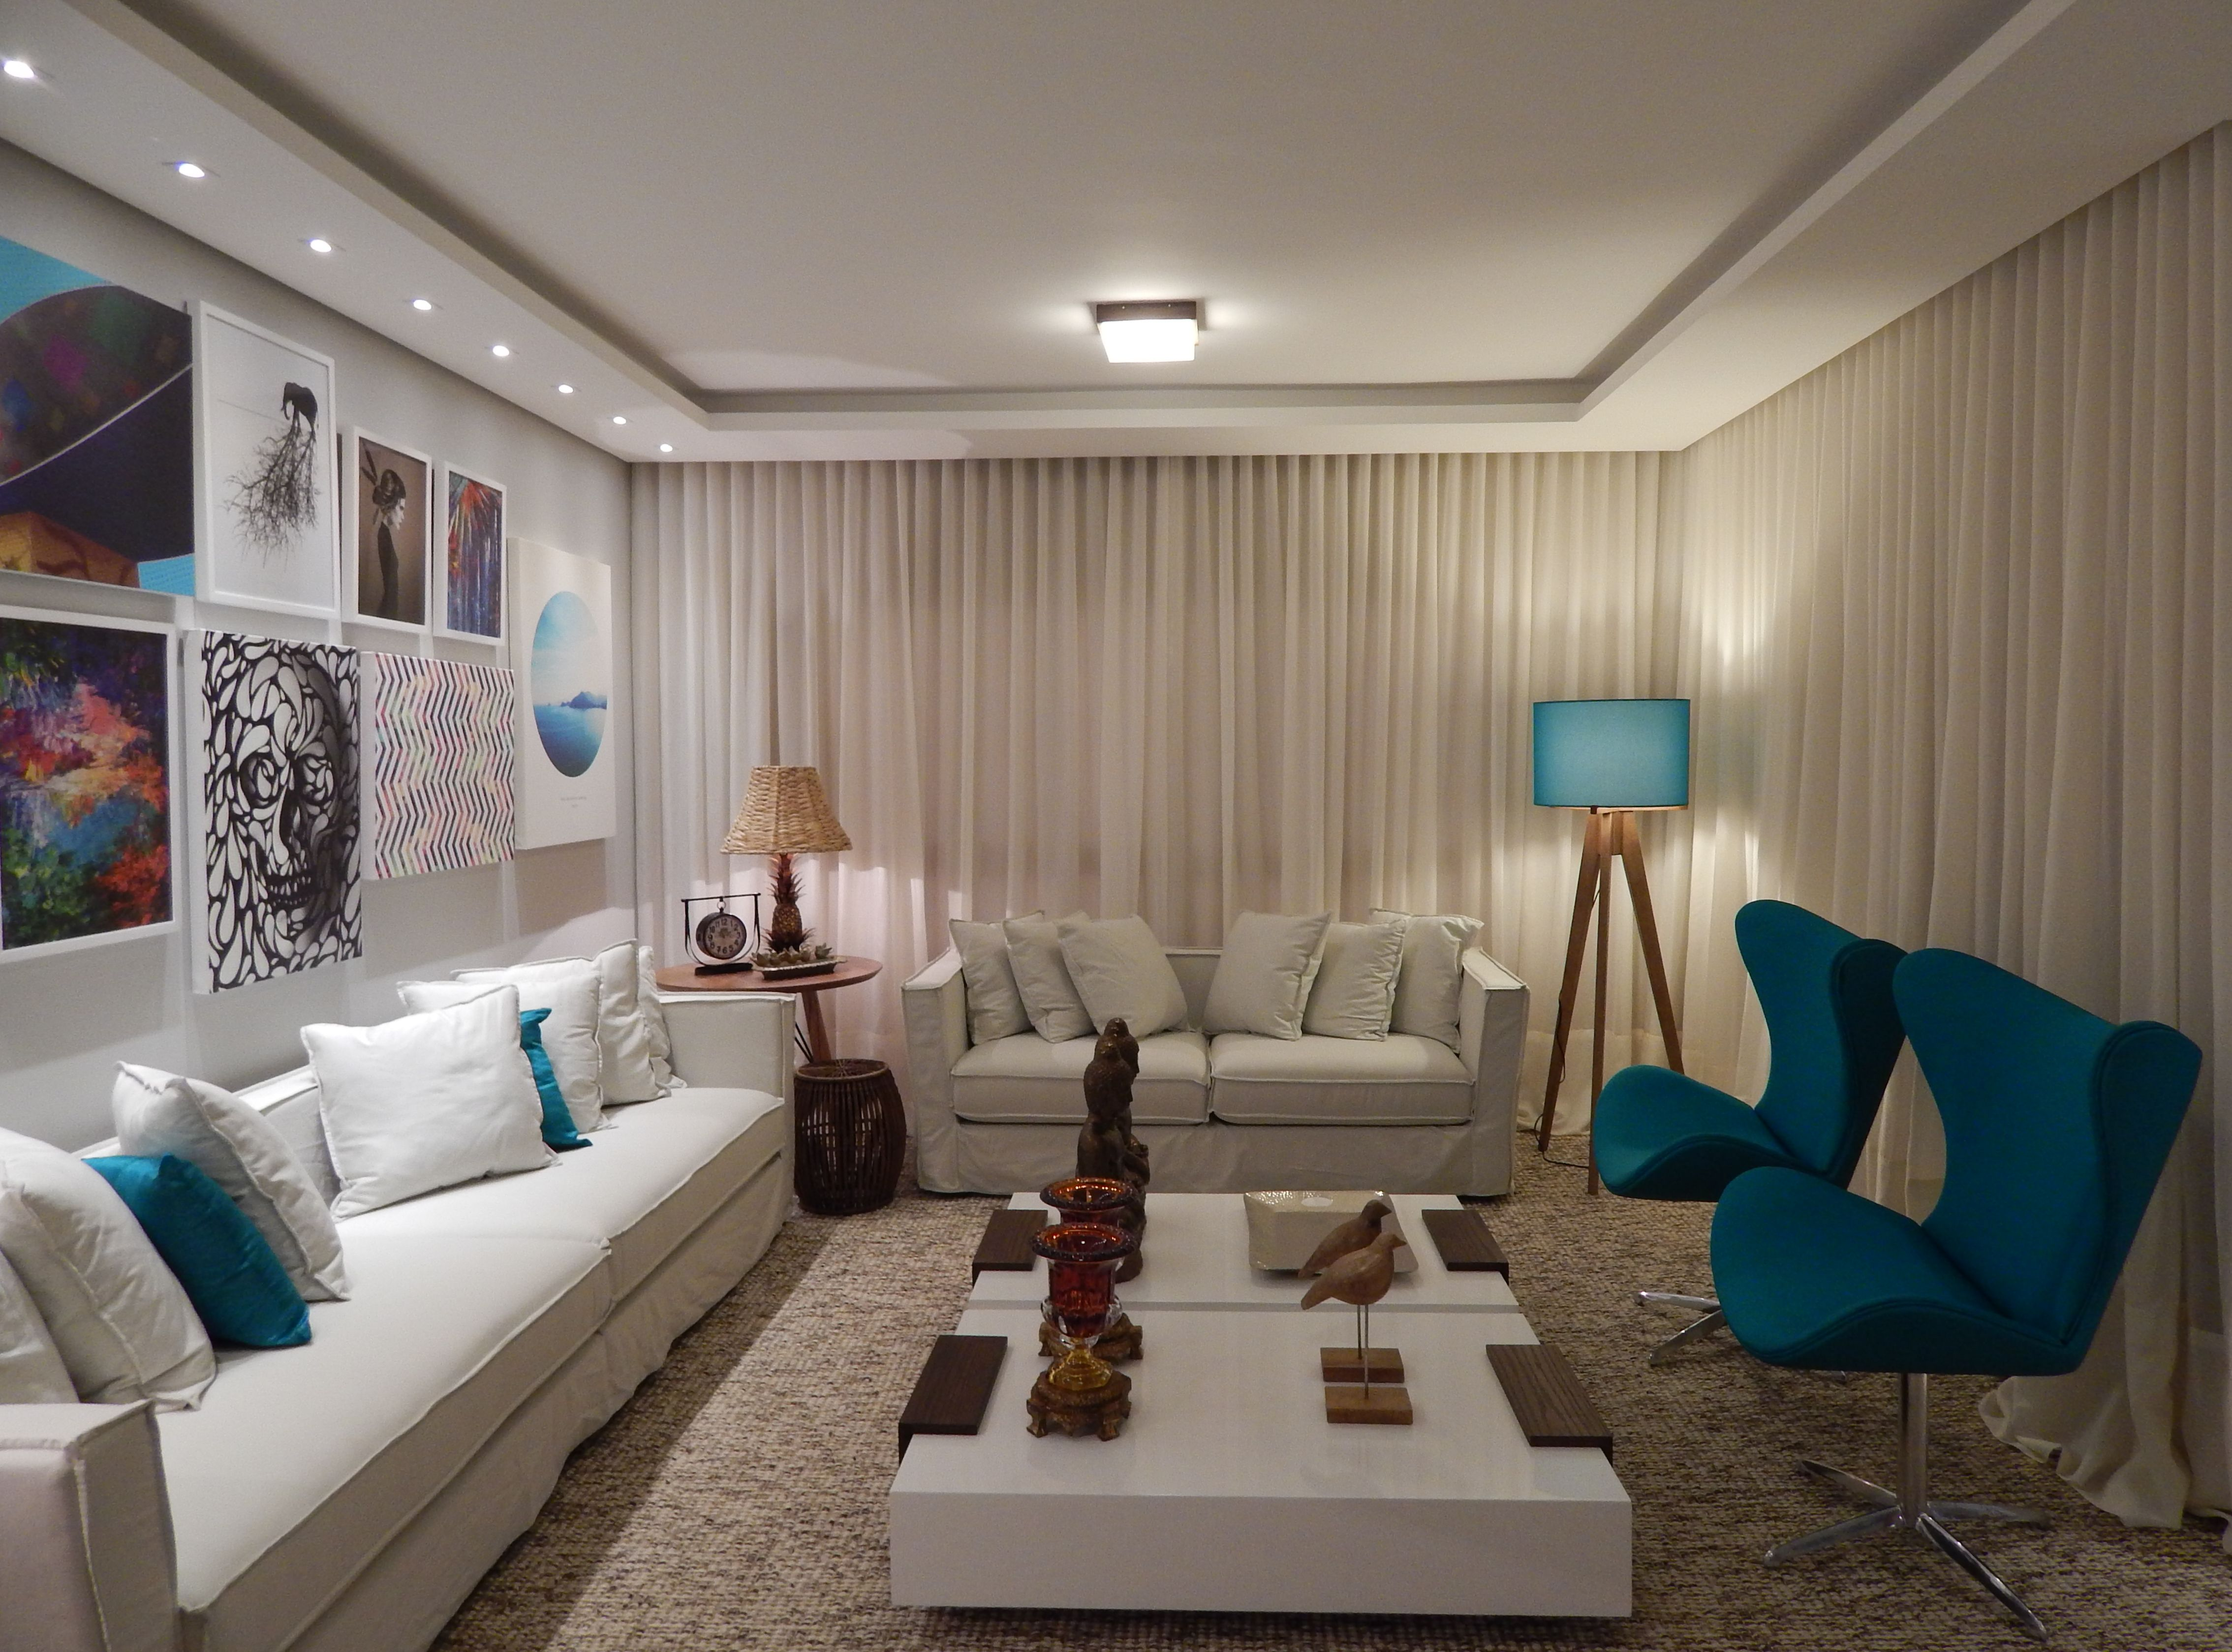 sala de estar 2014 arquiteta barbara panassi azul